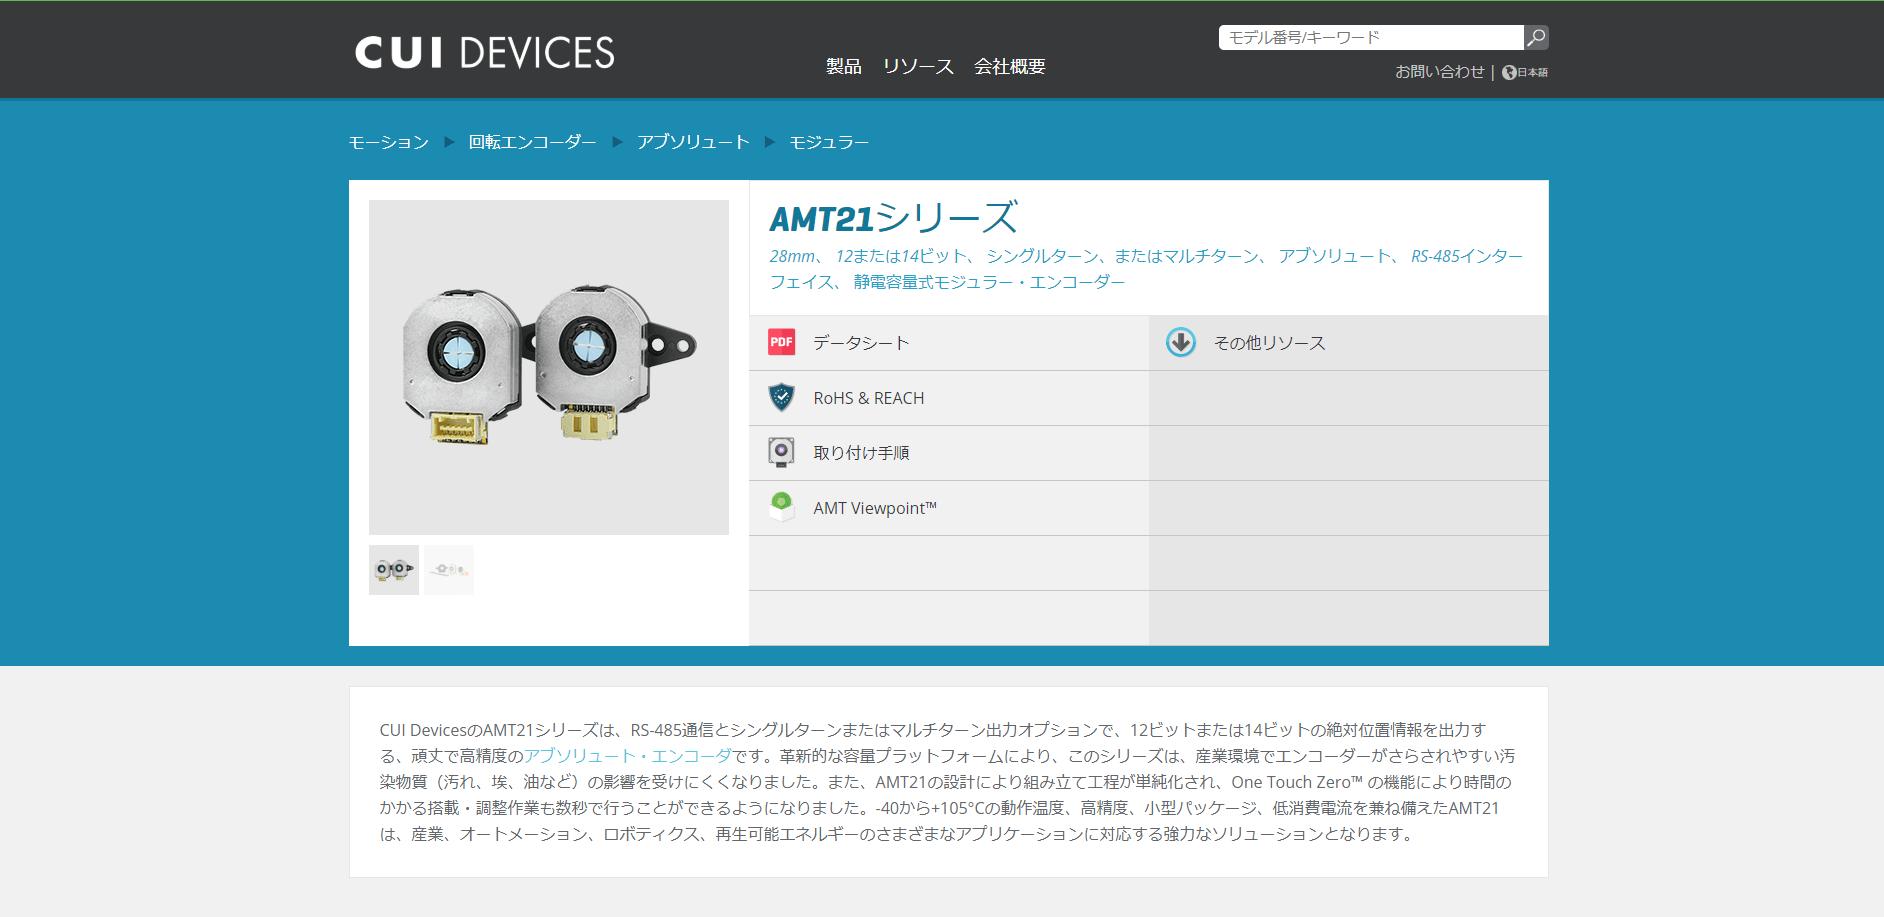 AMT21シリーズ